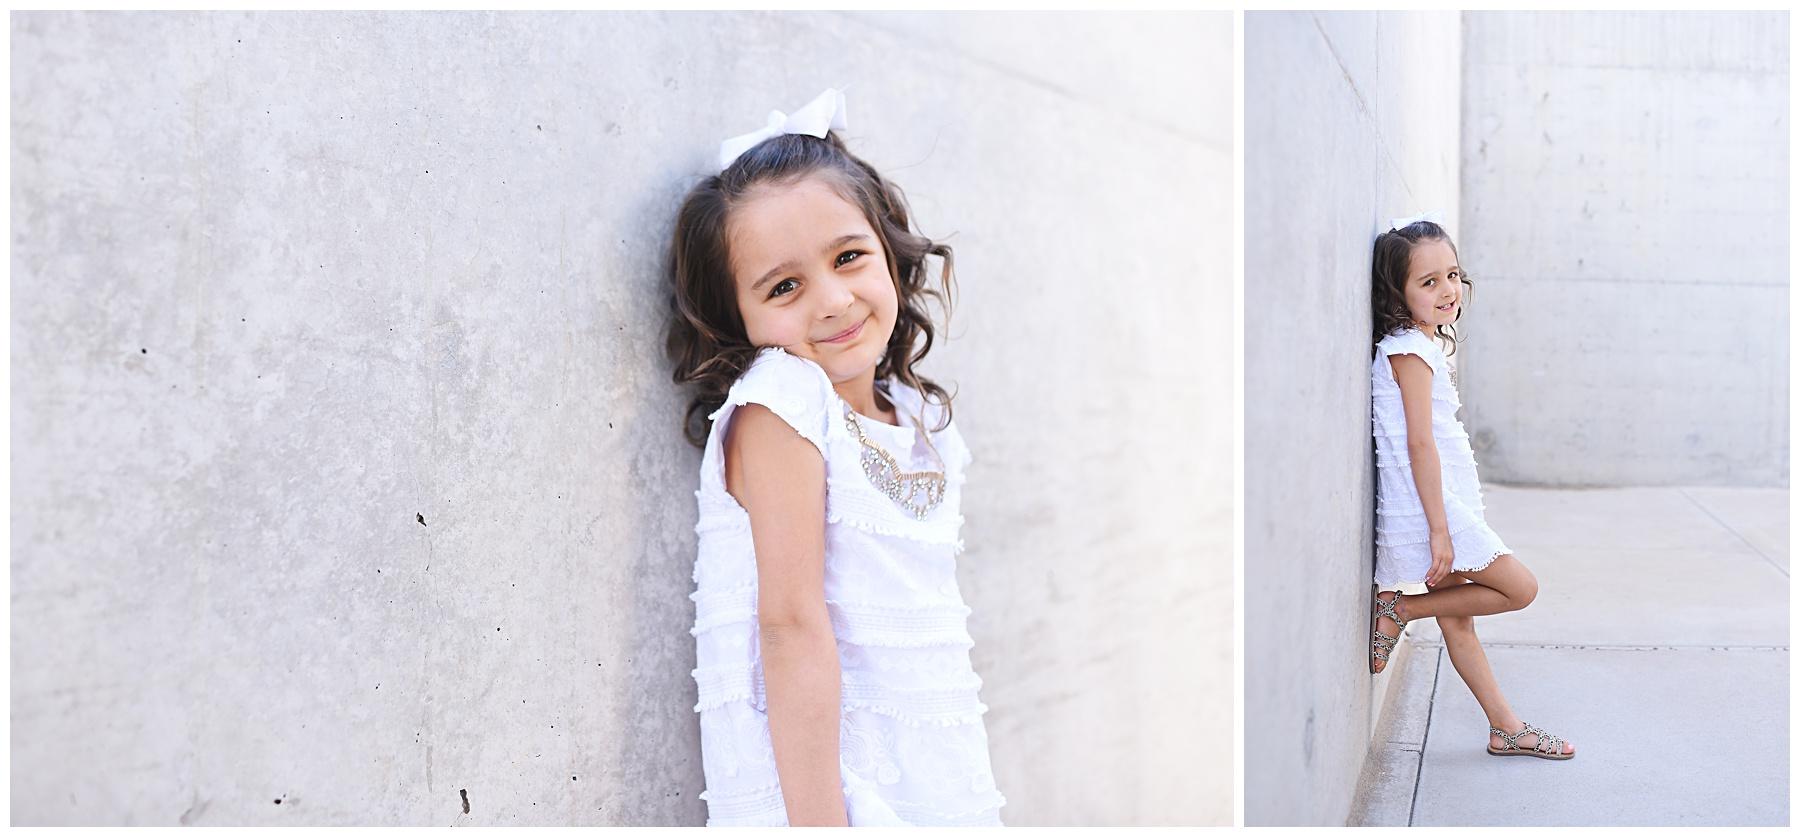 Child Photographer Urban location   SweetLife Photography